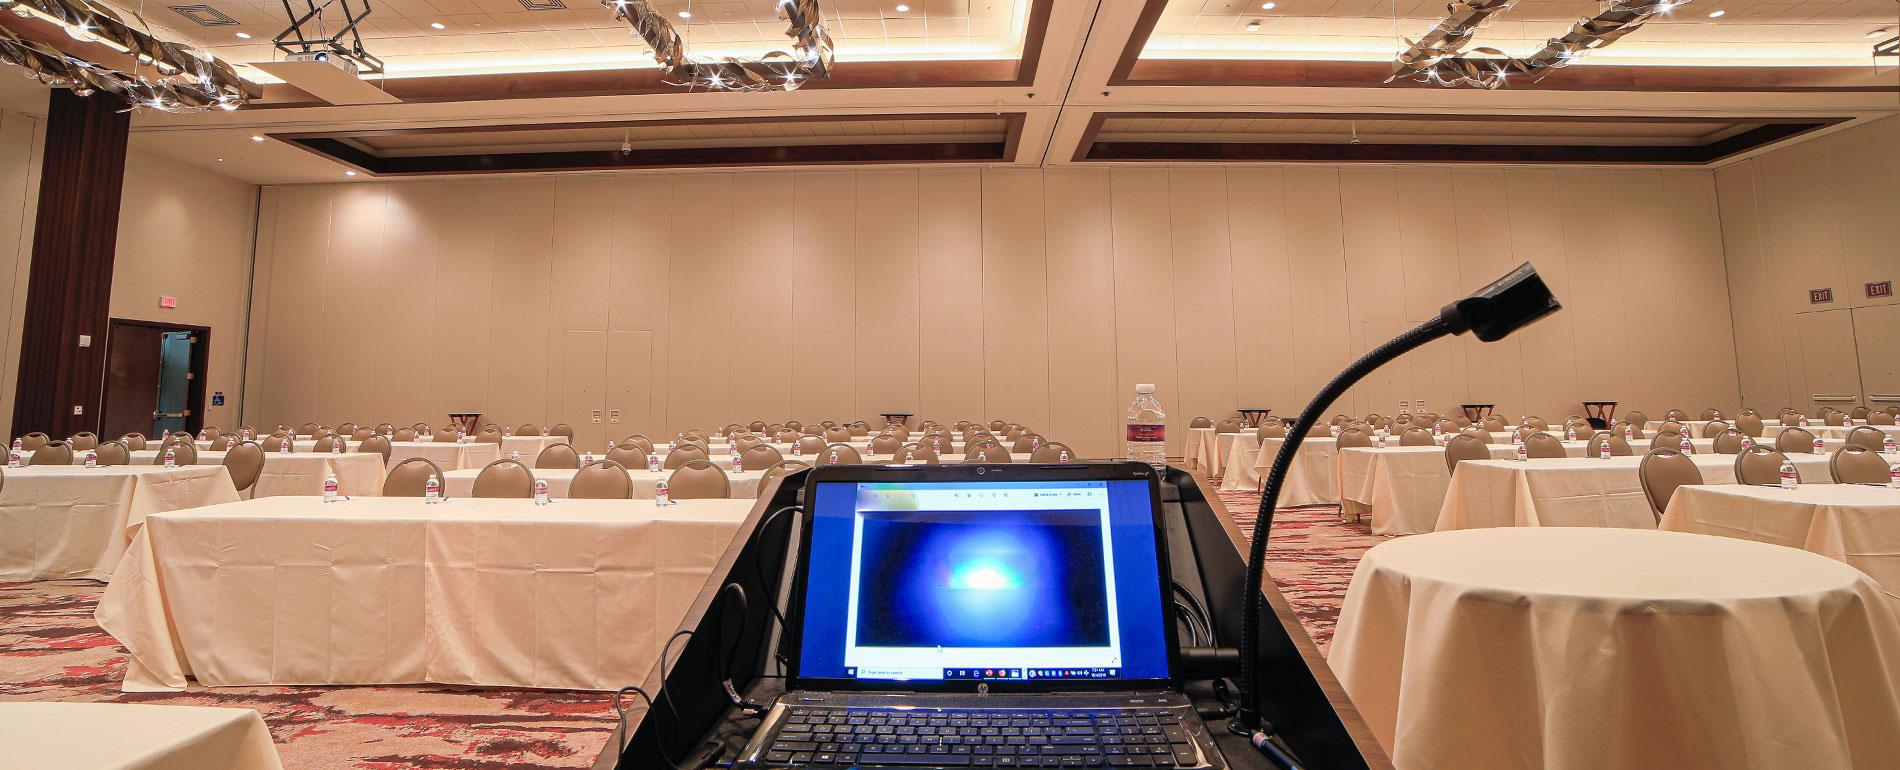 poconos convention center - classroom lecture room